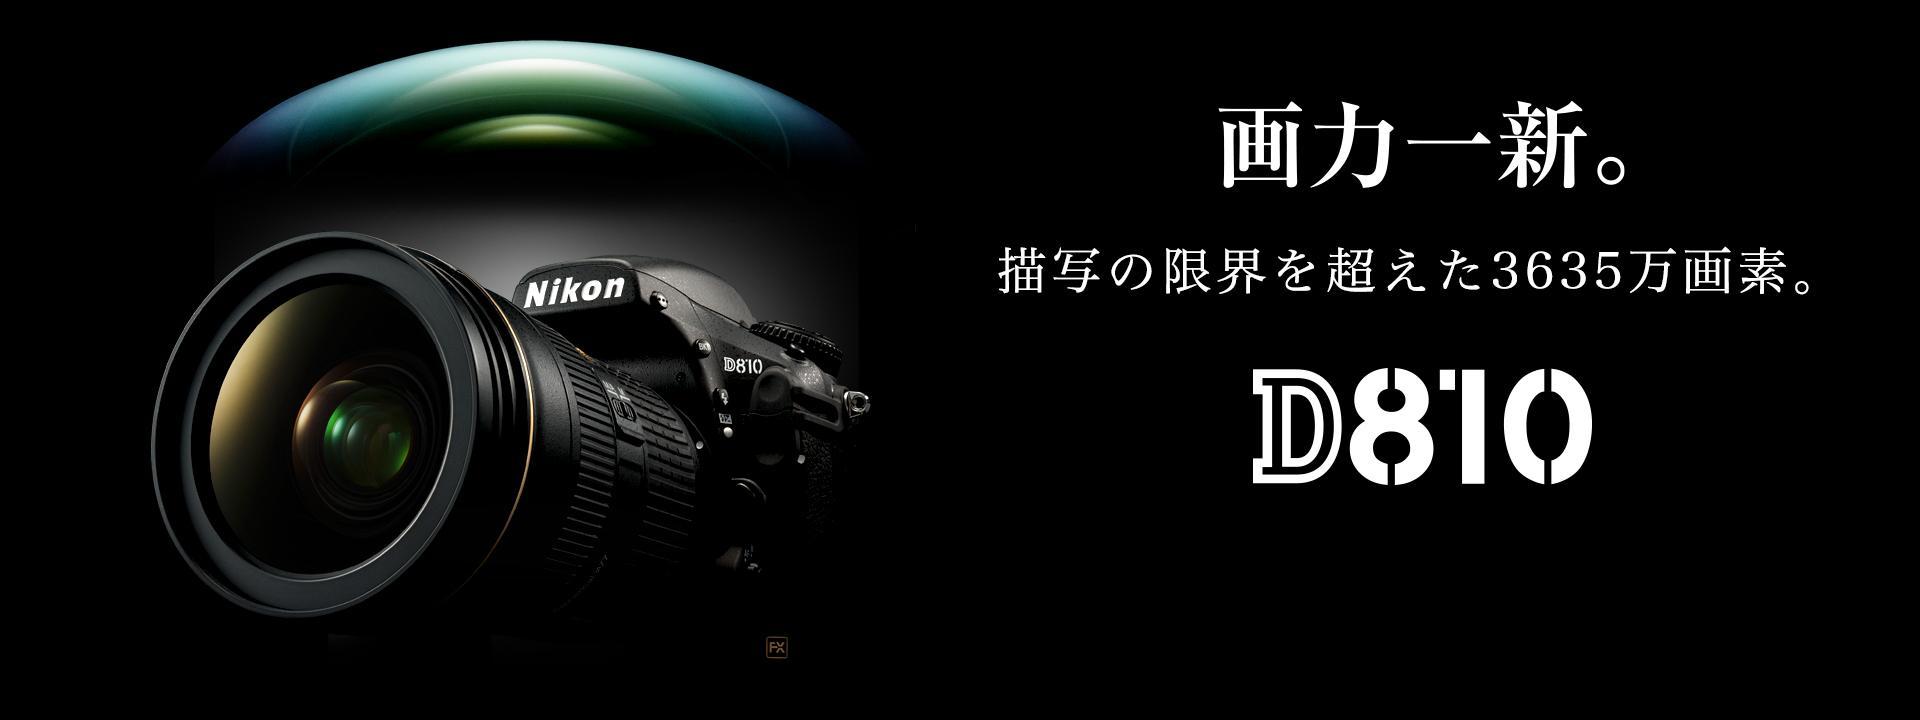 D810 宣伝広告